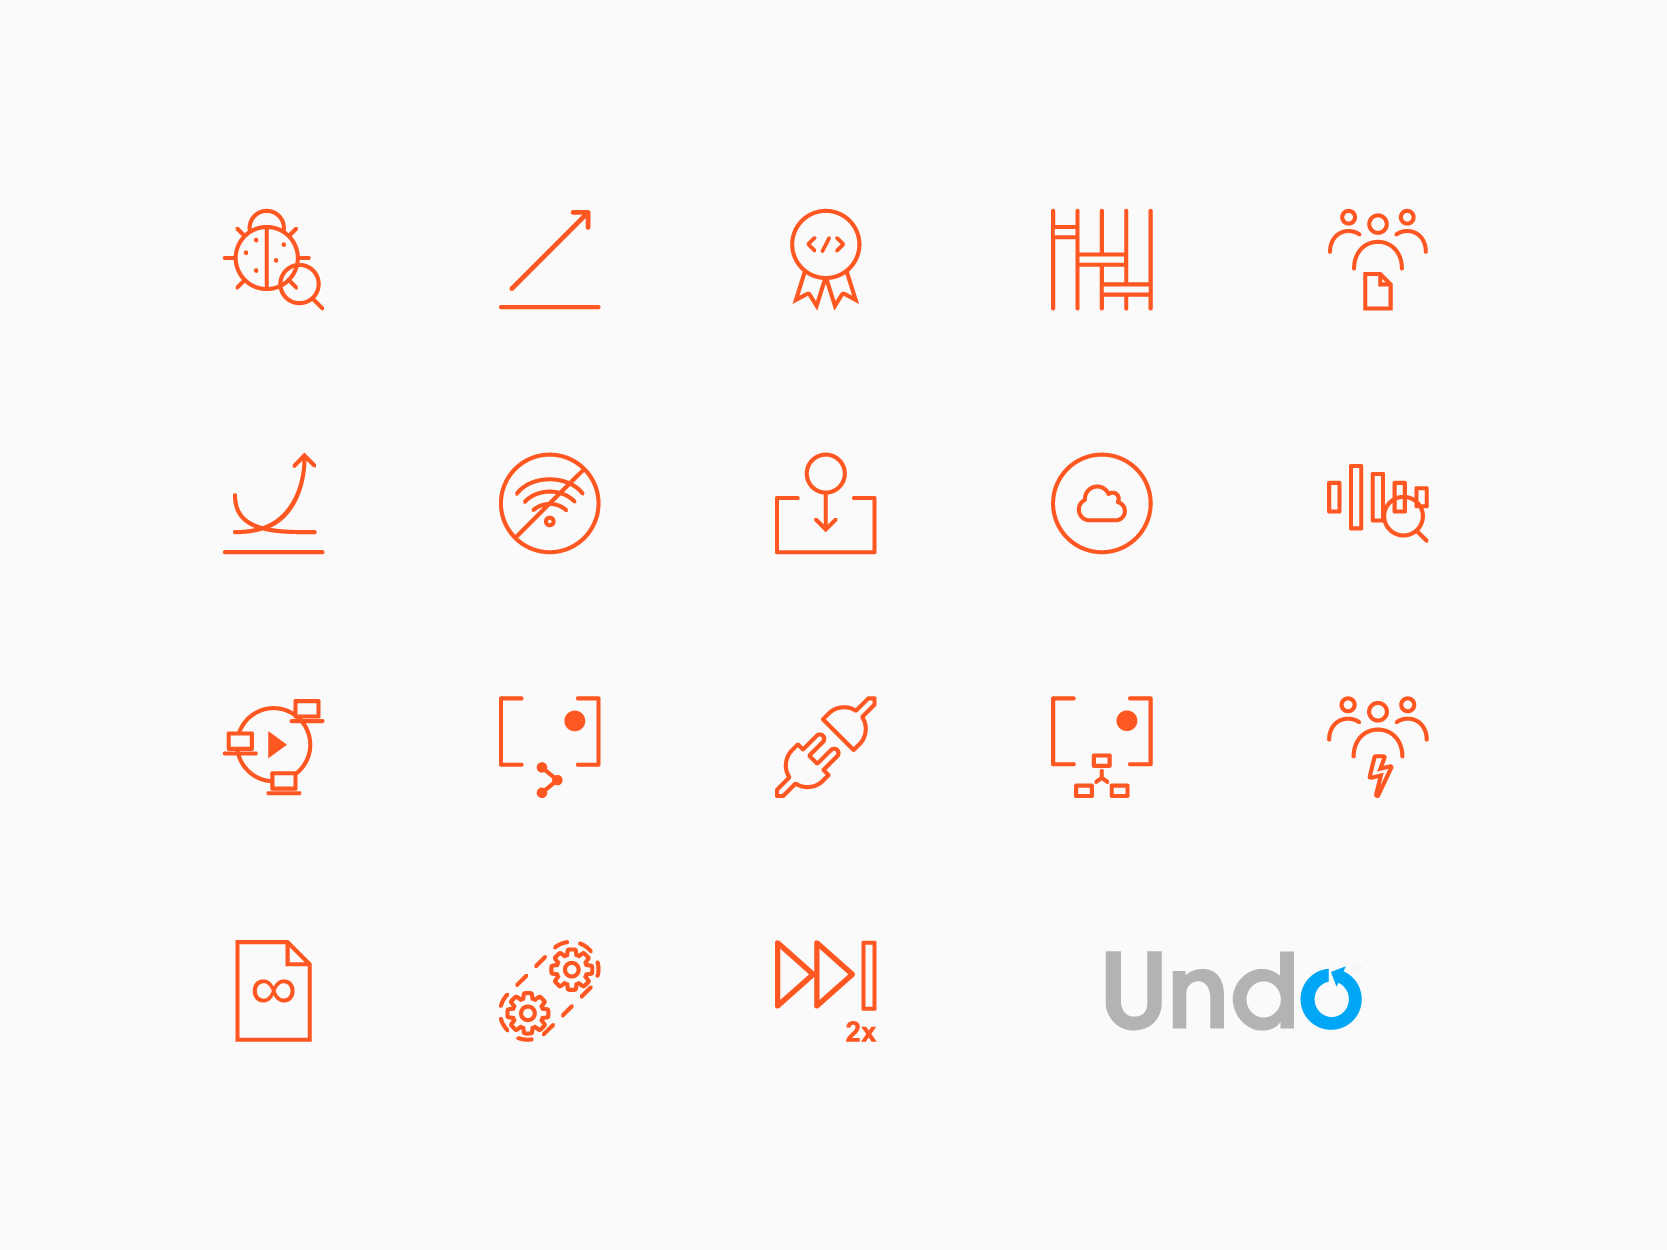 Undo.io project bespoke icon set, by Chiara Mensa for Onespacemedia